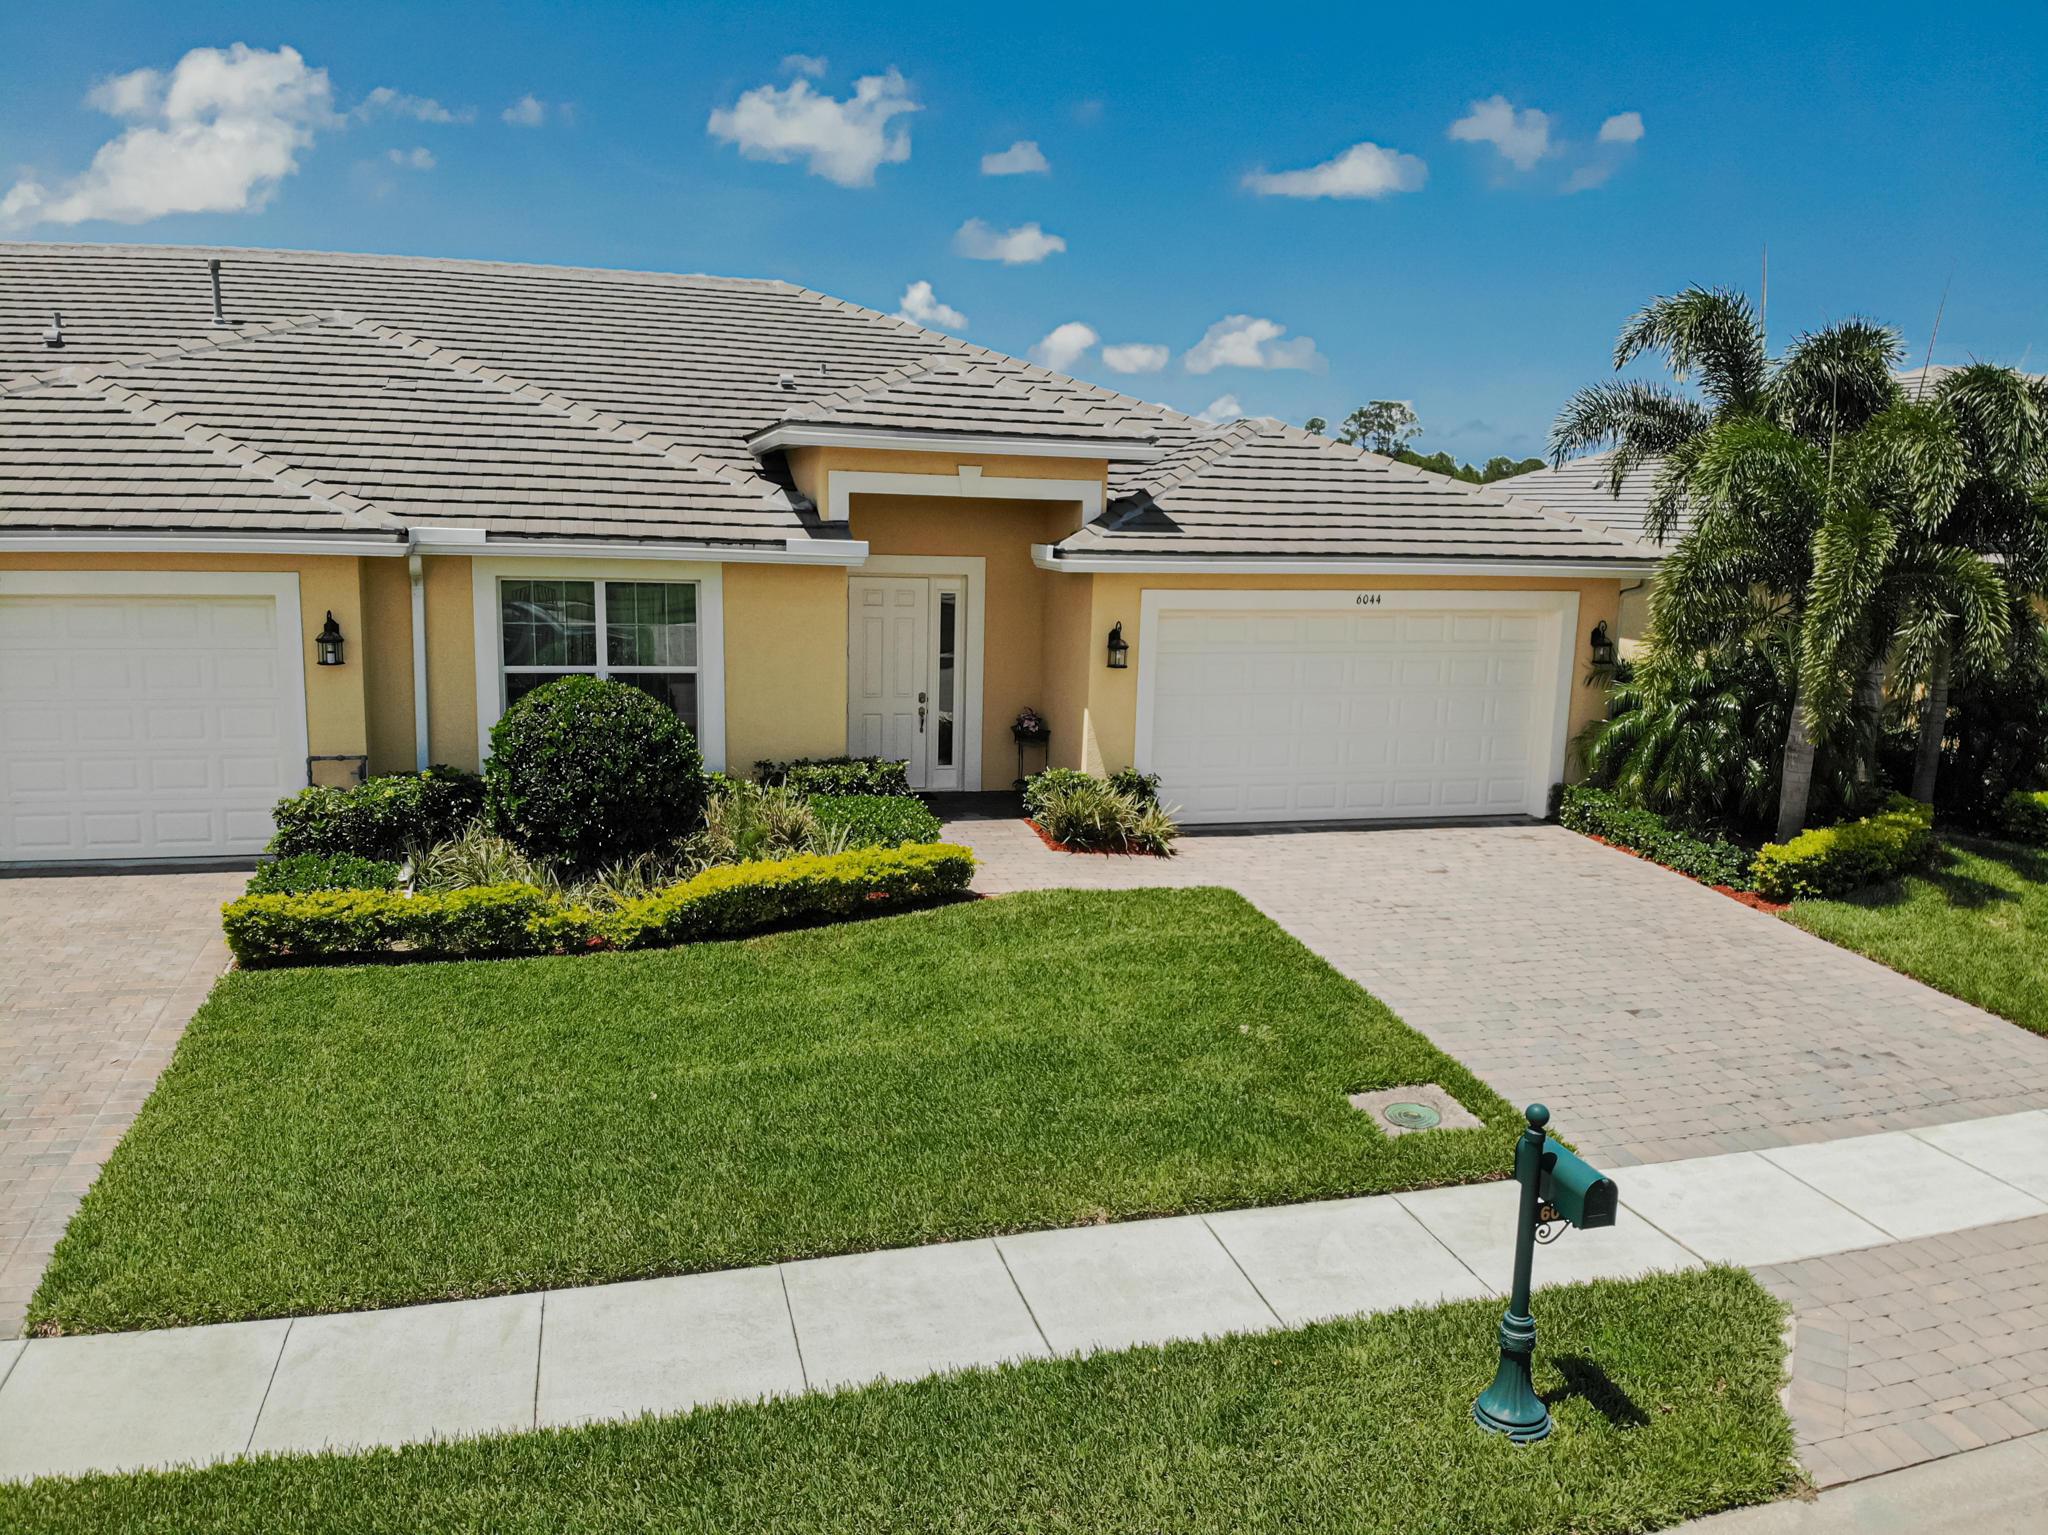 6044 Cullen Way Nw, Port Saint Lucie, FL 34983